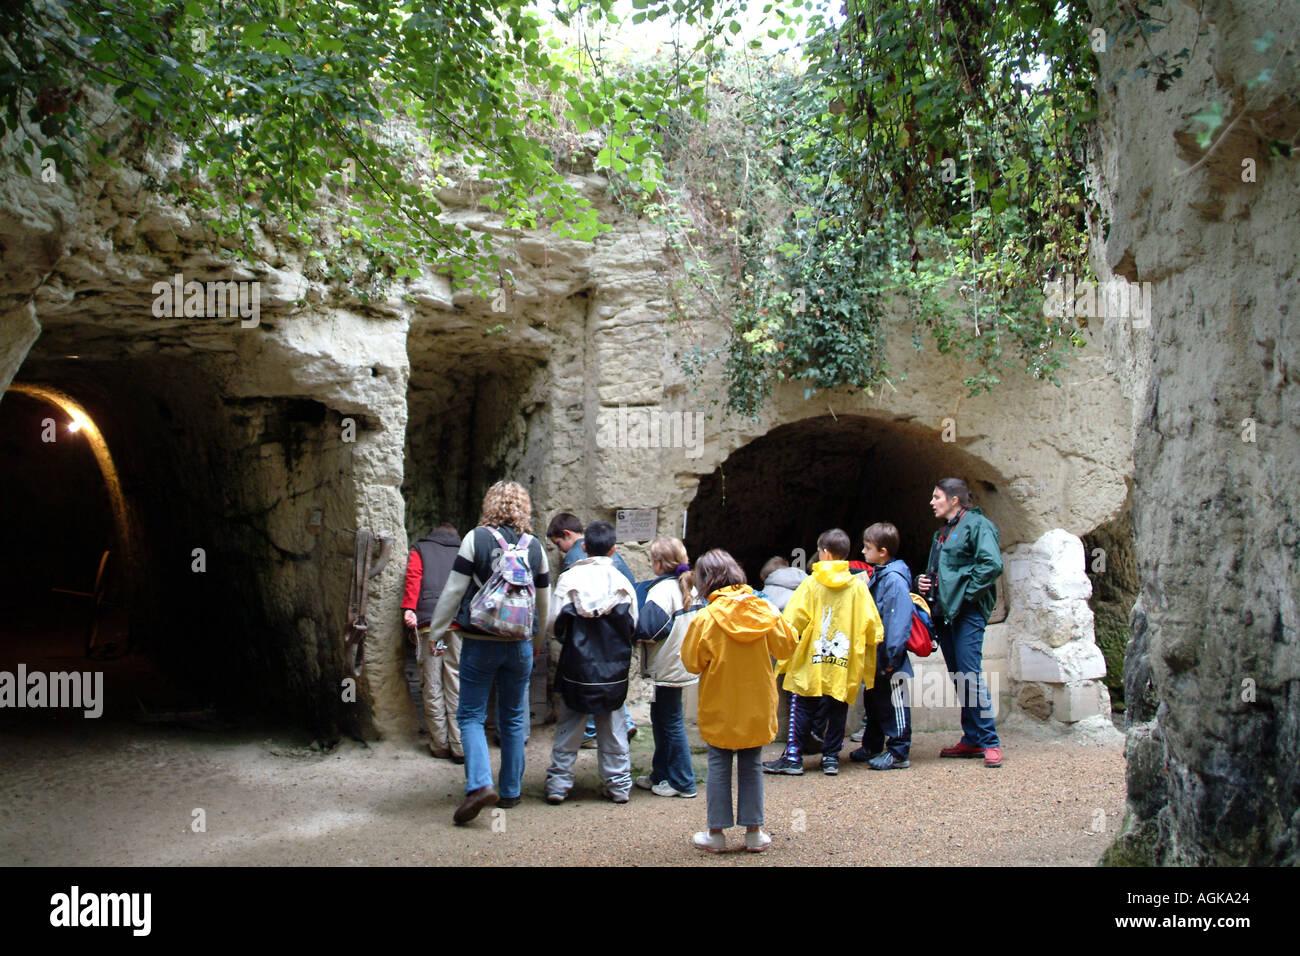 Troglodytes underground home built into caves at La Fosse near Saumur France EU school children visit - Stock Image